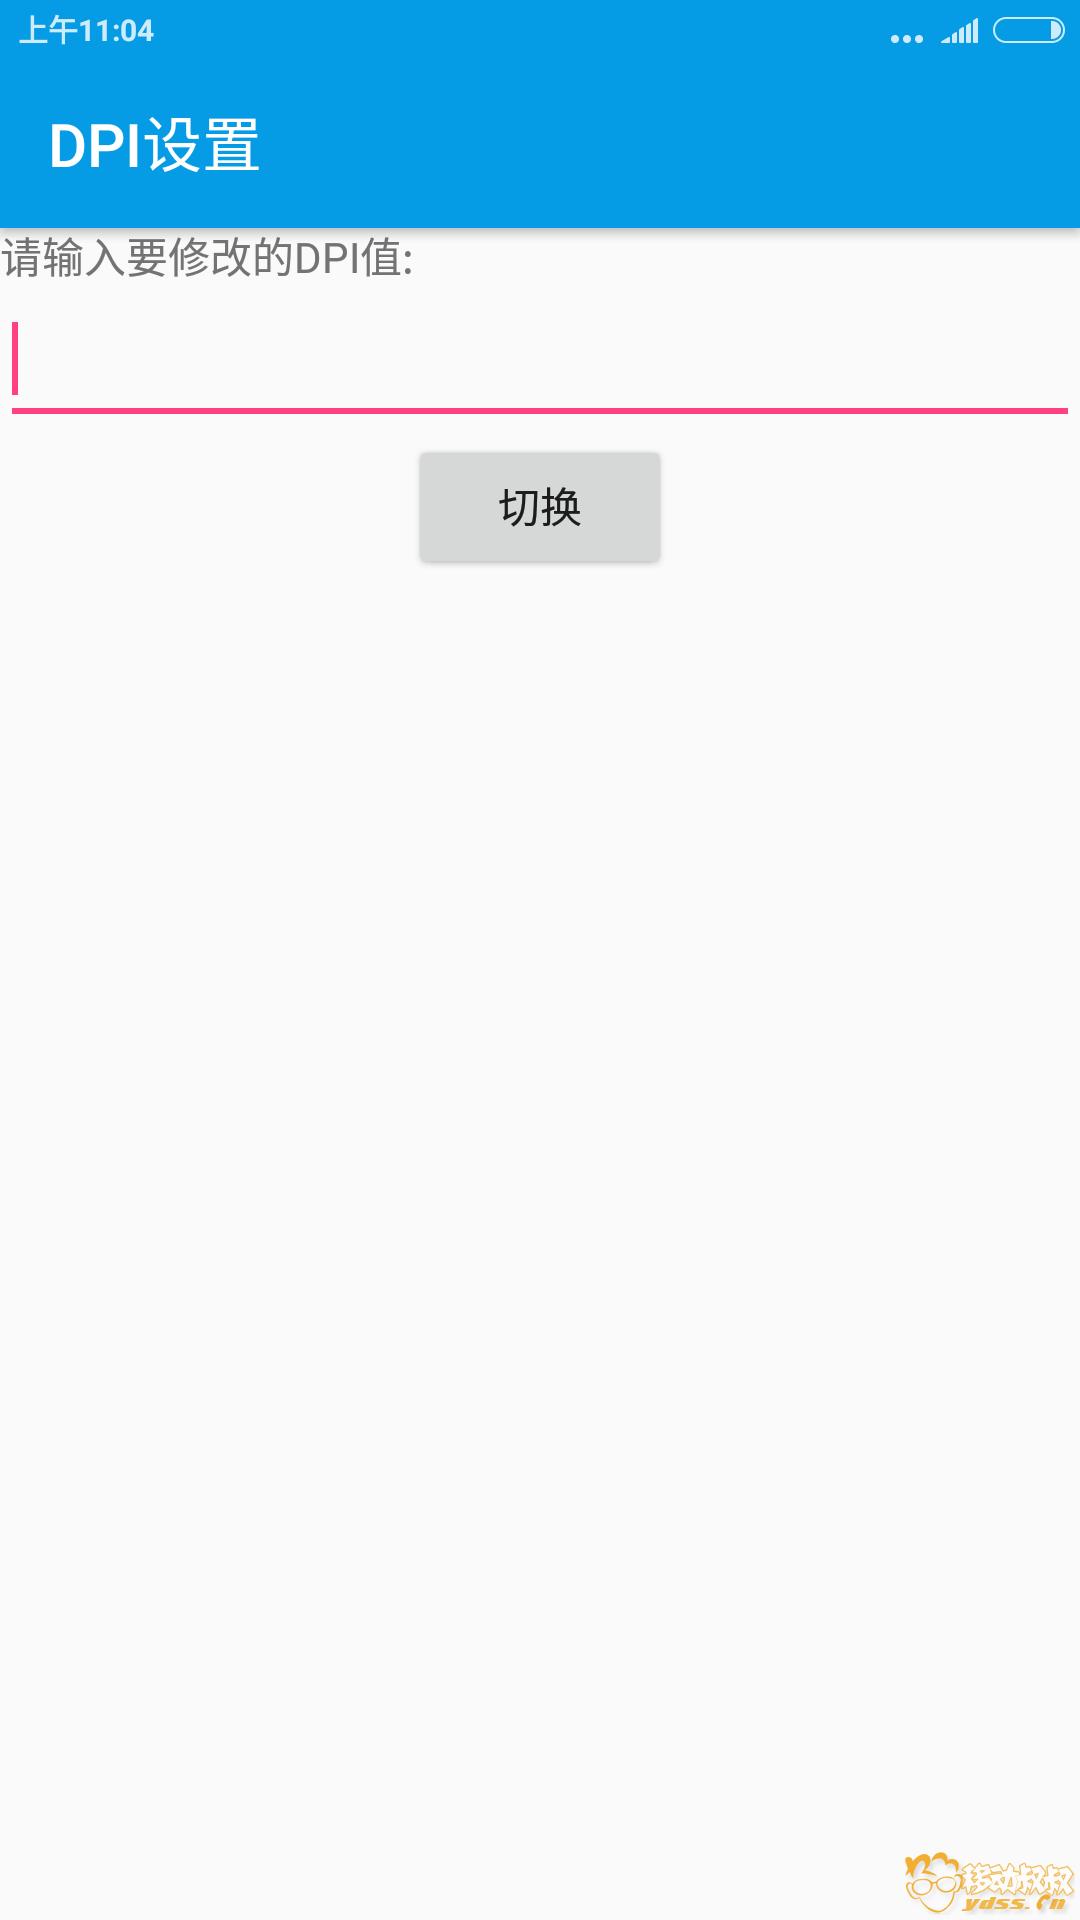 Screenshot_2018-01-28-11-04-49-047_com.example.dh.myapplication.png